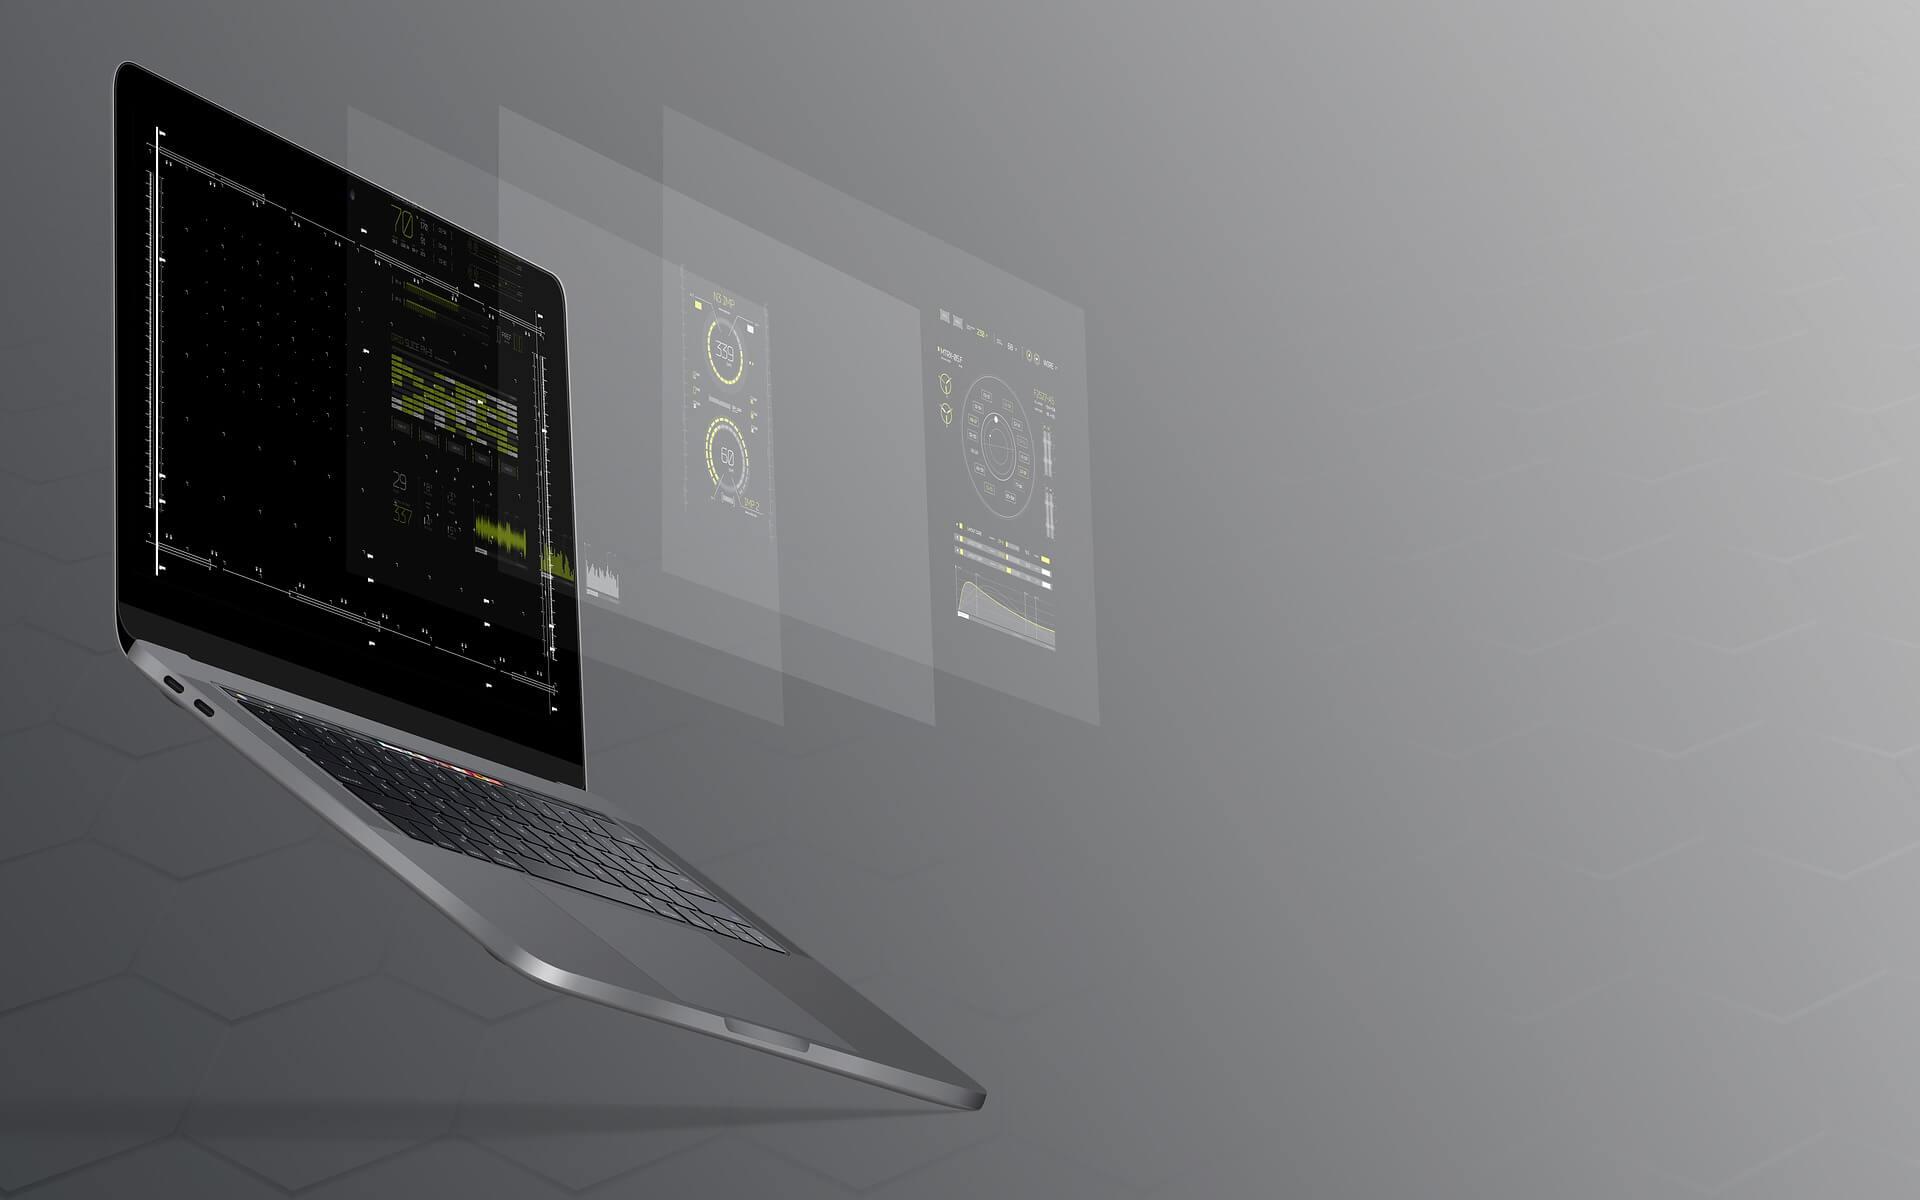 laptop portatil pc grafica pontevedra vigo